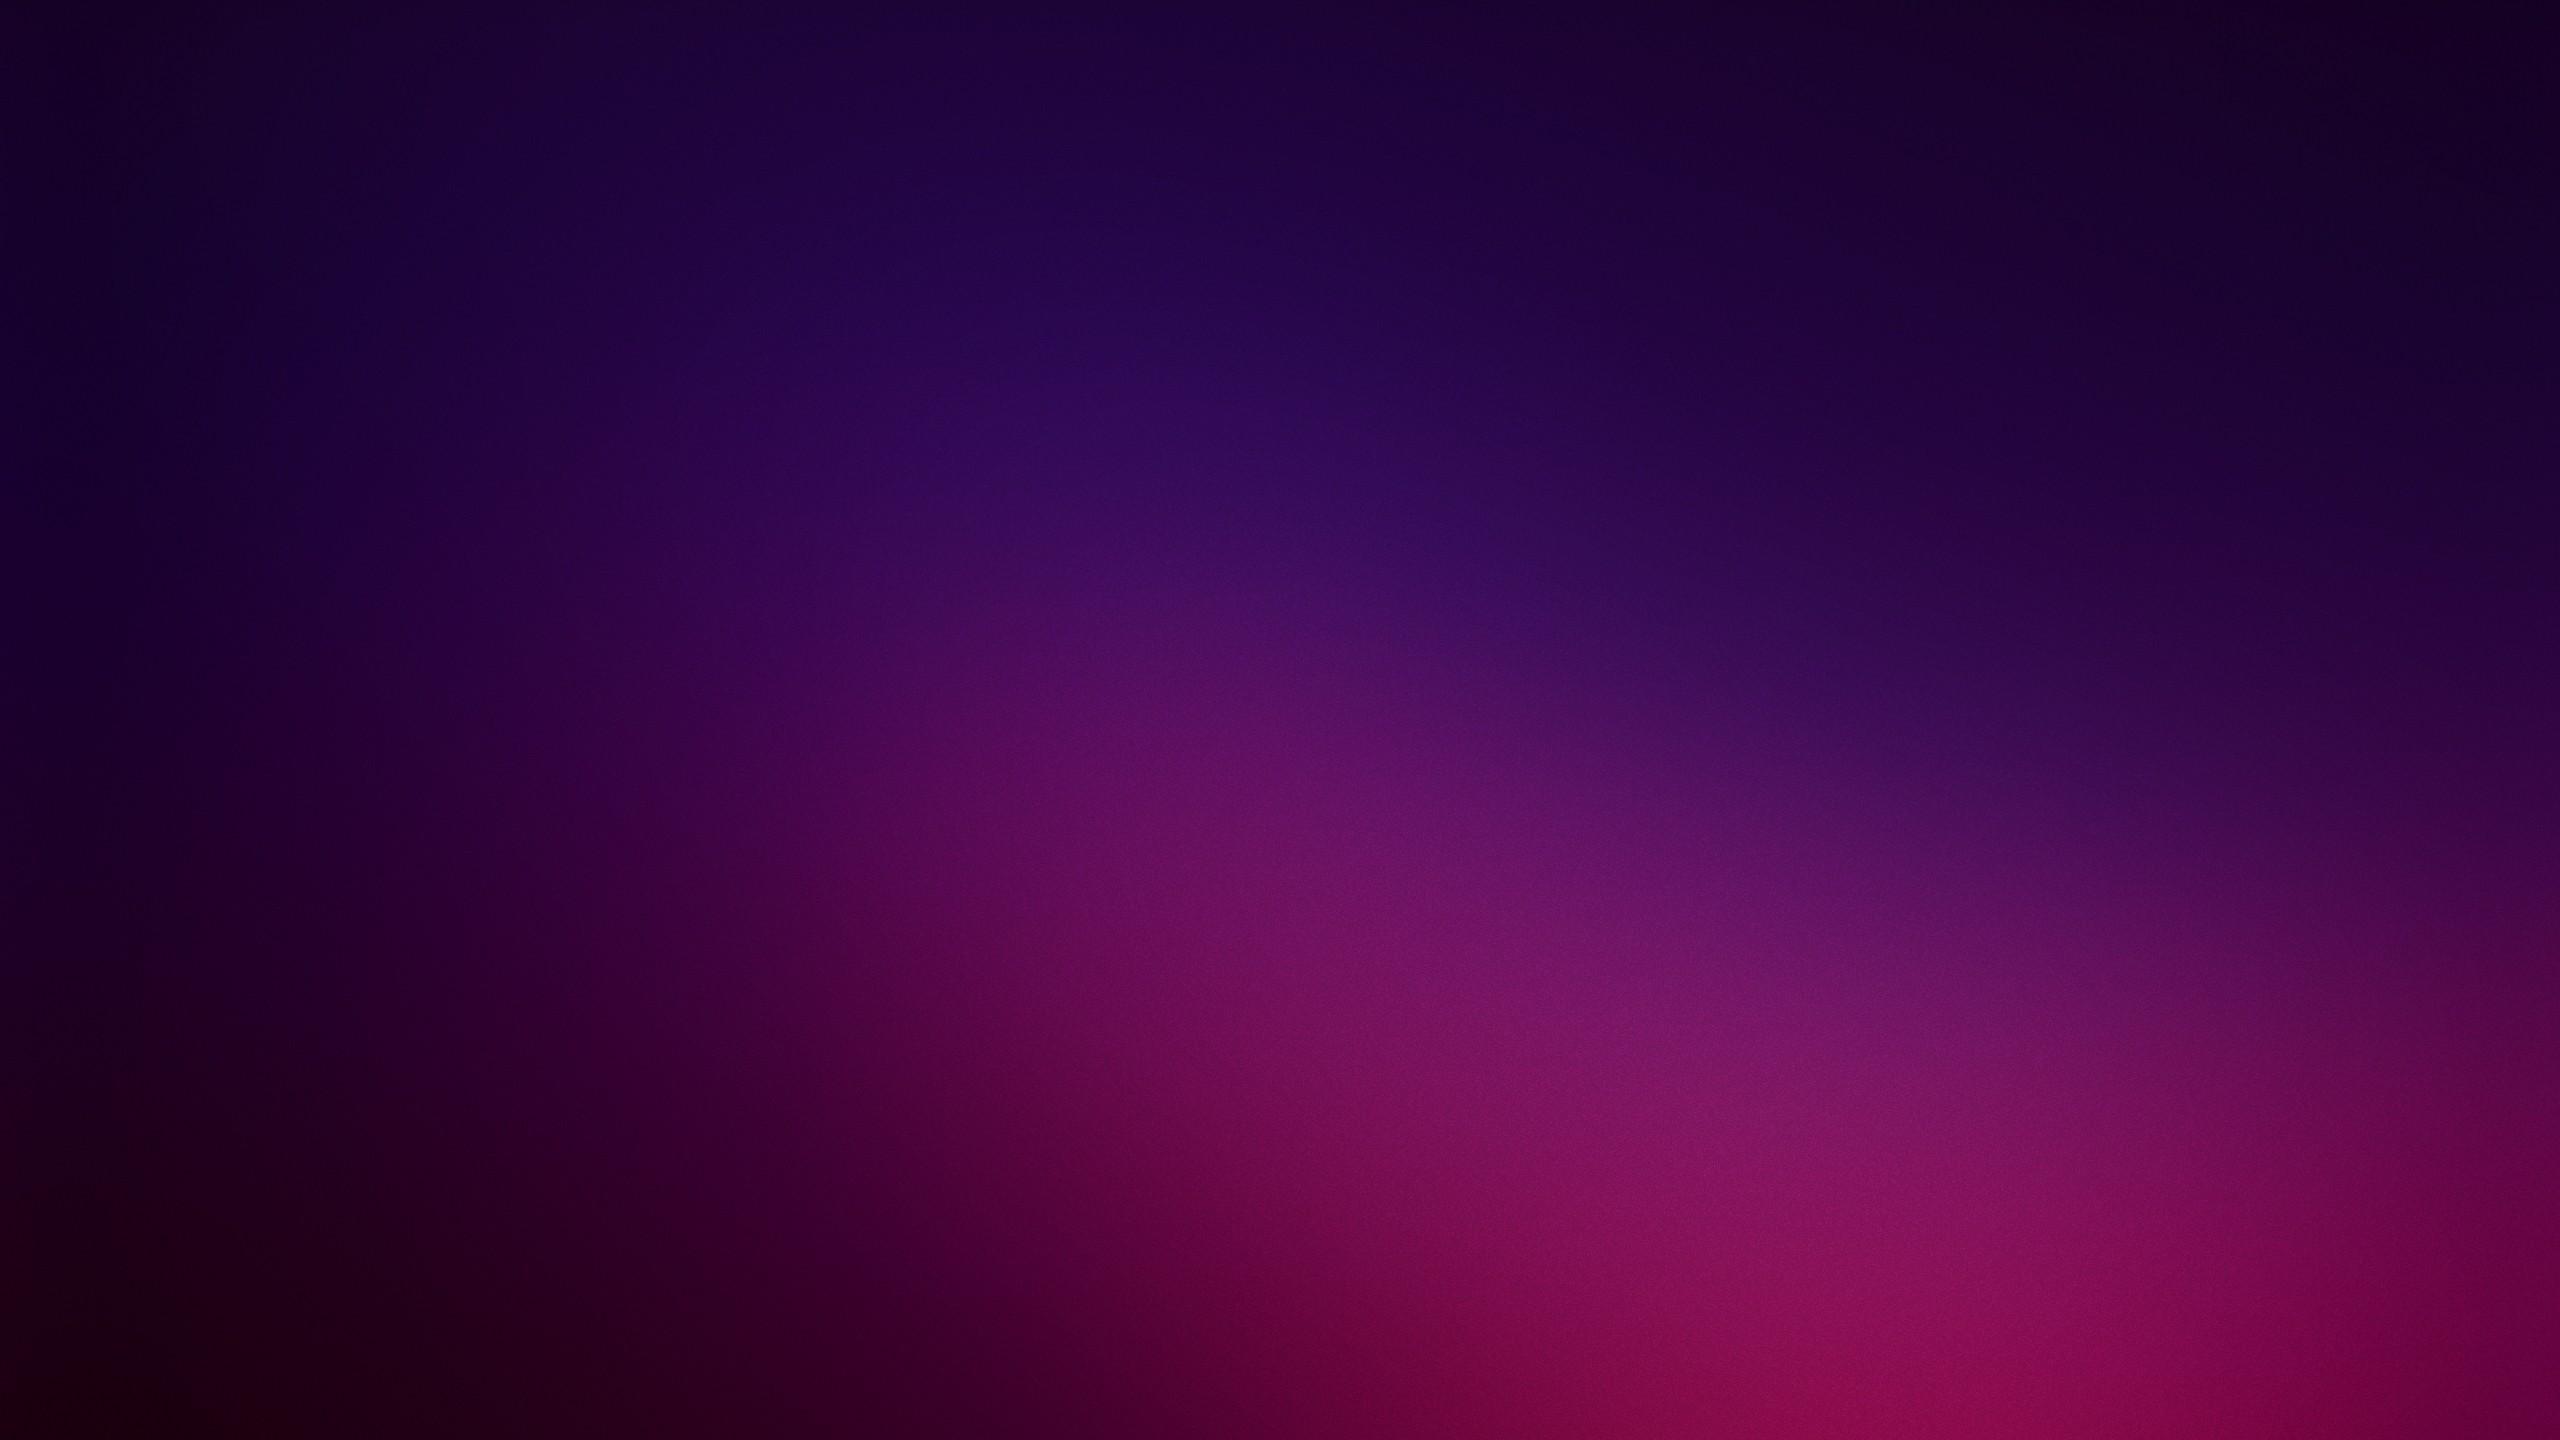 Purple Hd Wallpaper Background Image 2560x1440 Id592367